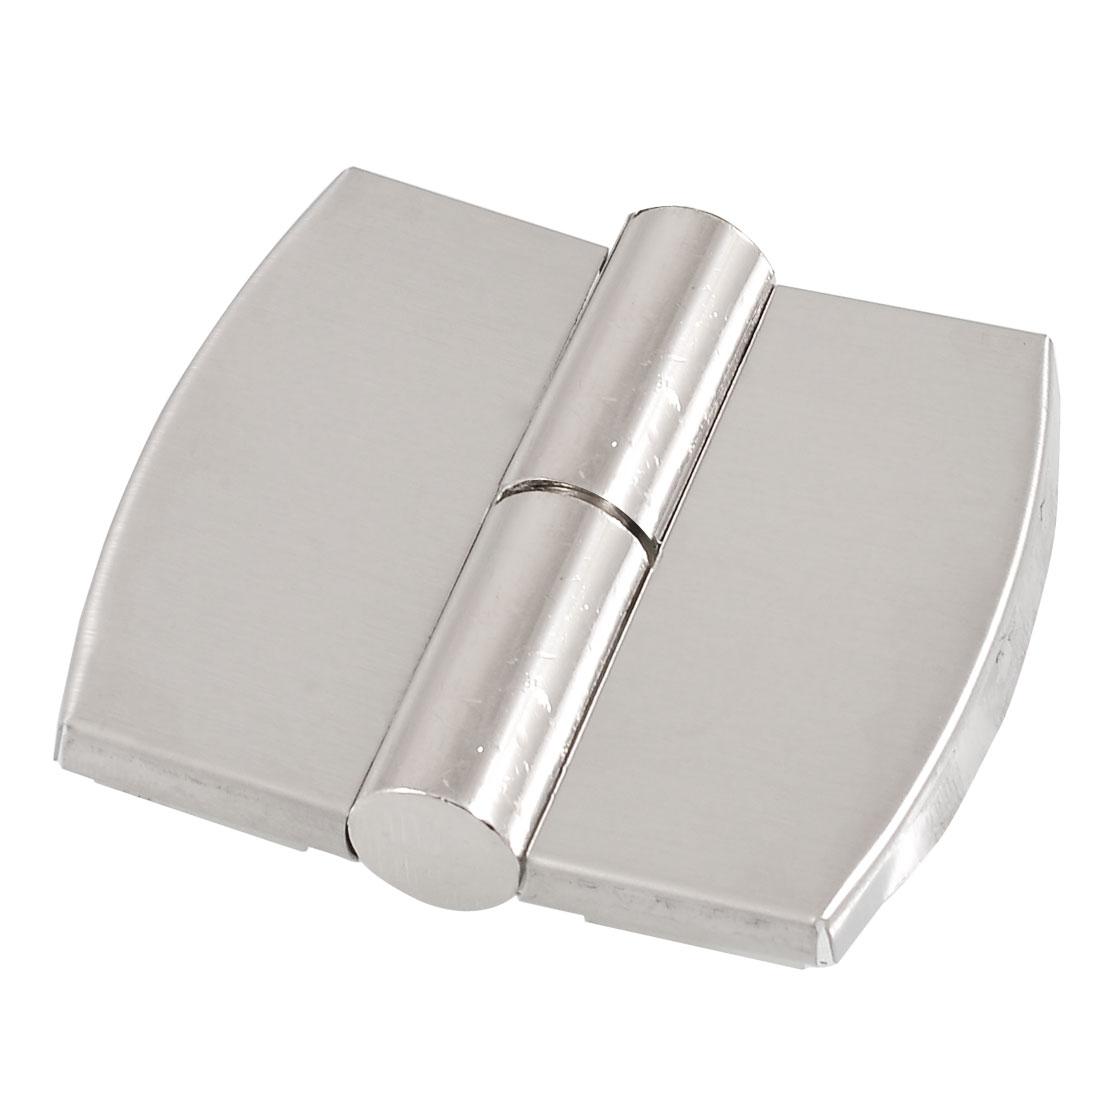 Door Cabinet Silver Tone Stainless Steel Left Hand Lift Off Hinge